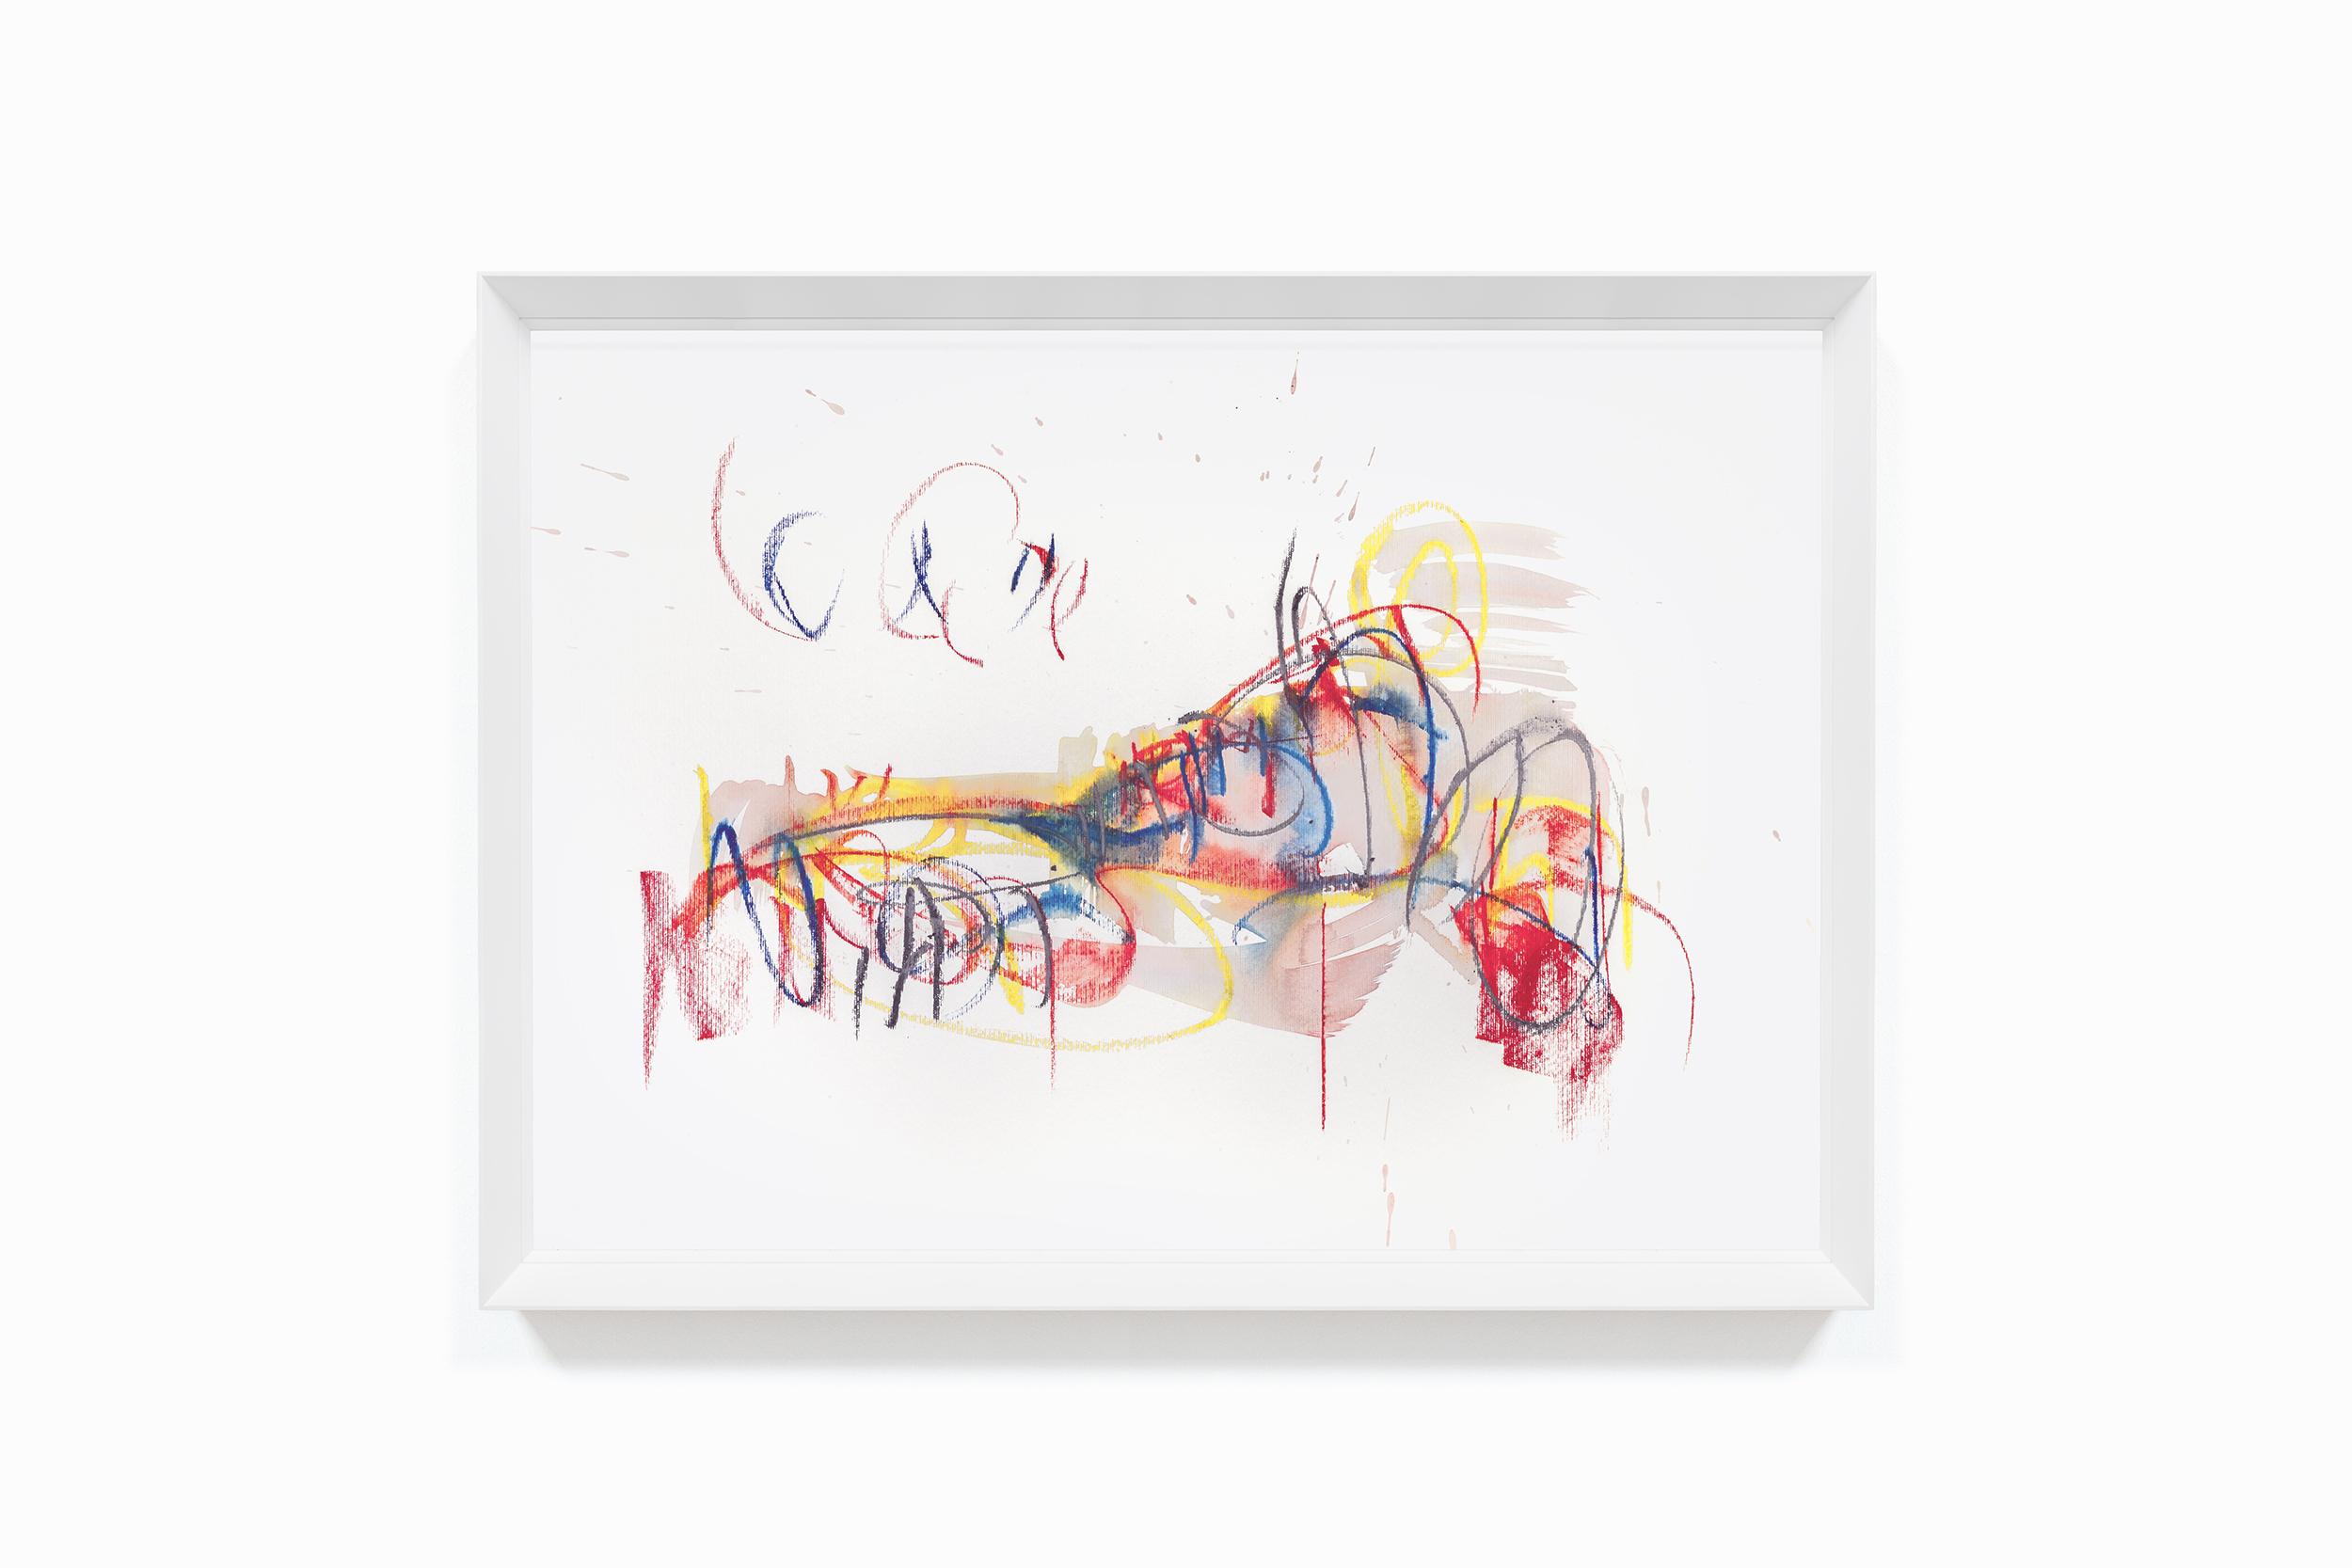 184B Andre Gigante Pintura Painting bonjourmolotov La.jpg